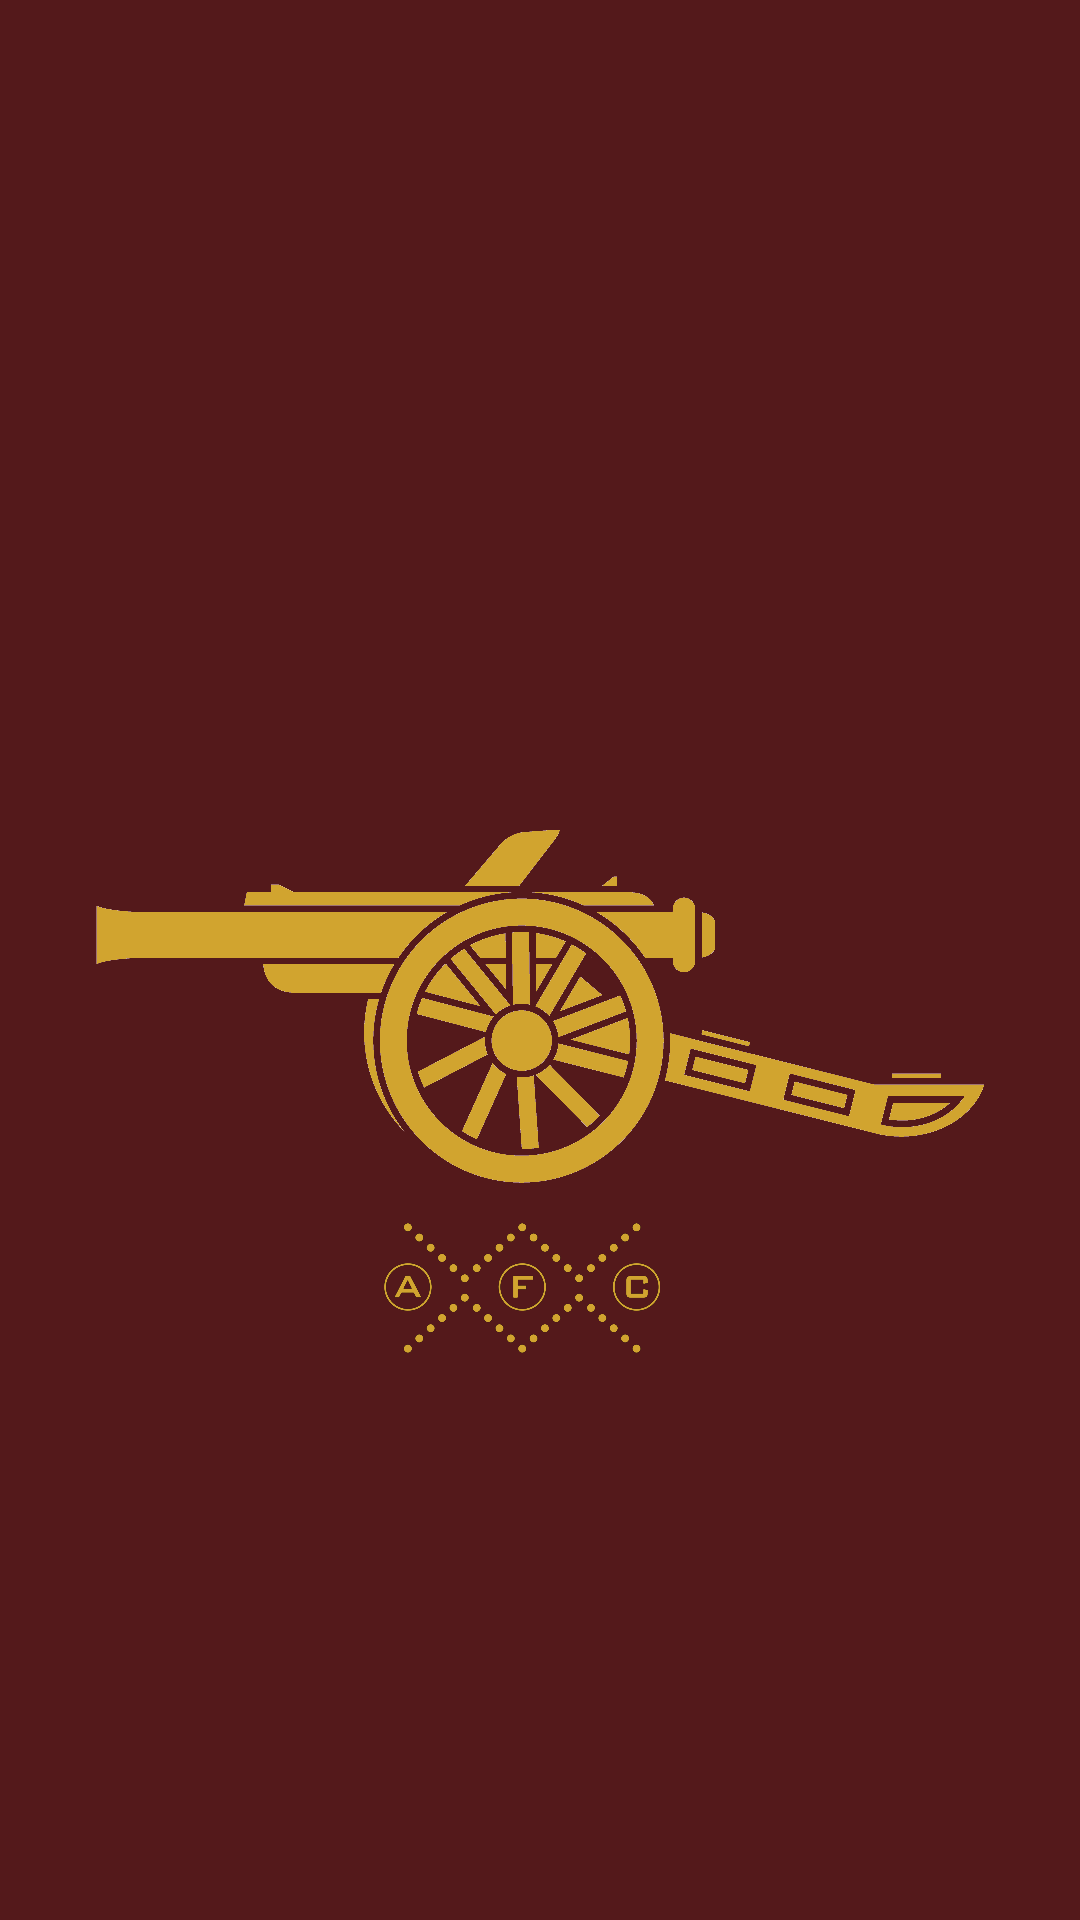 arsenal logo wallpapers 2017 wallpaper cave